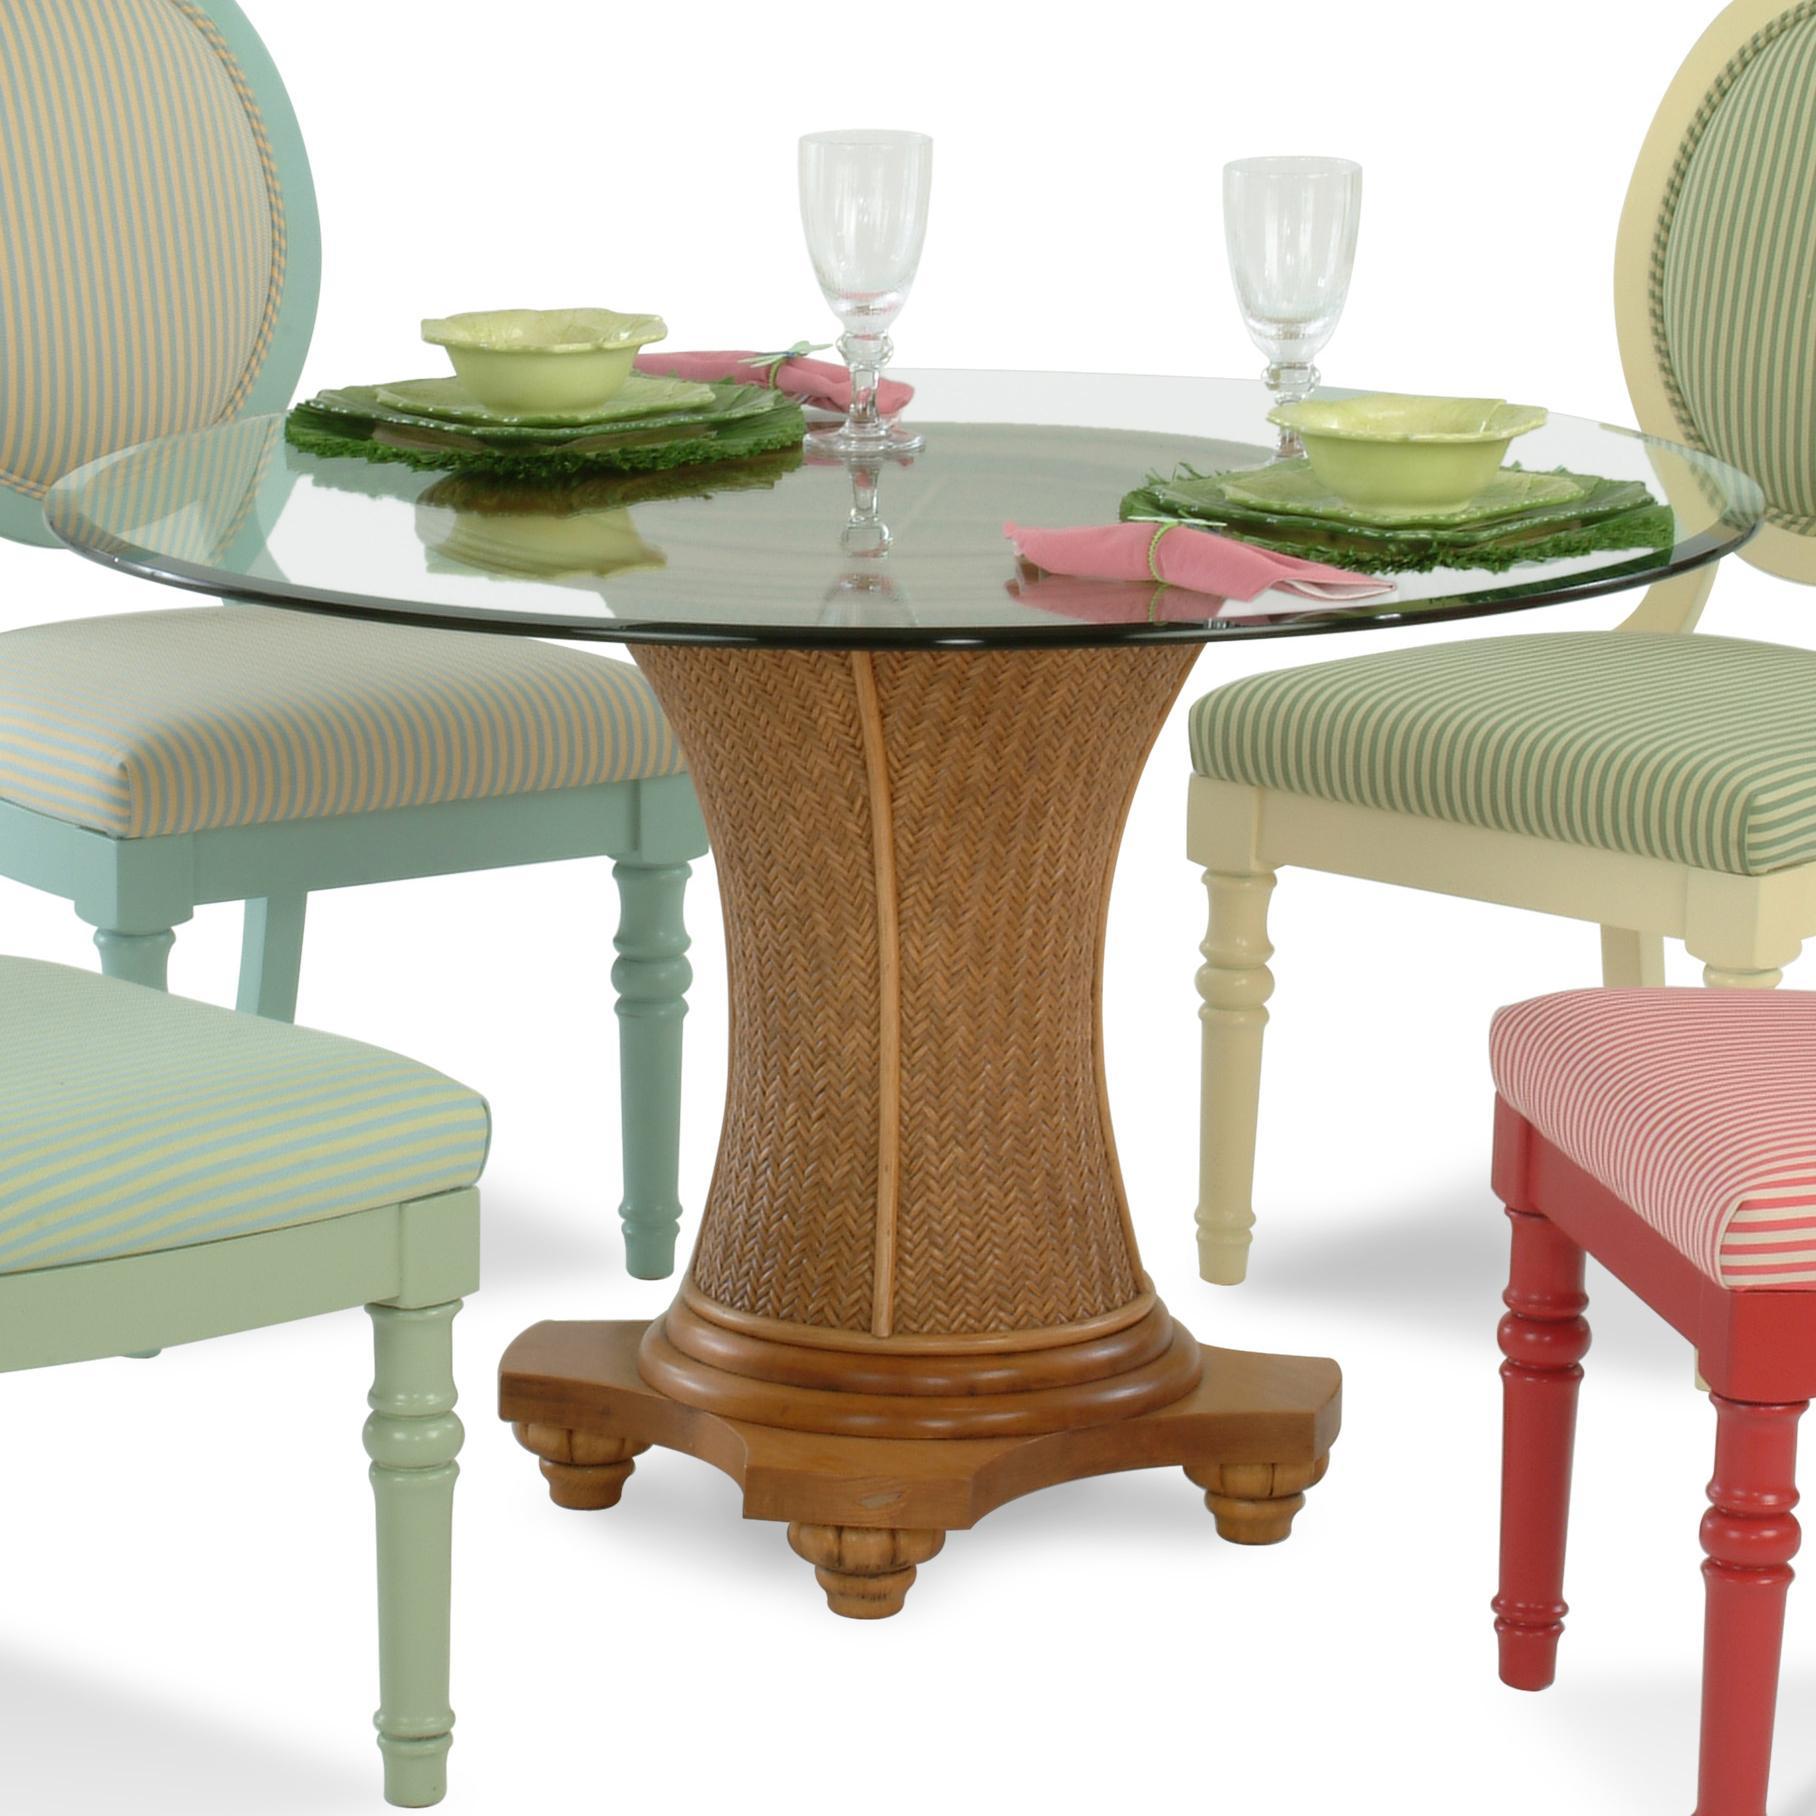 Vendor 10 sawgrass 848 075a tropical round glass table for Ashley furniture sawgrass